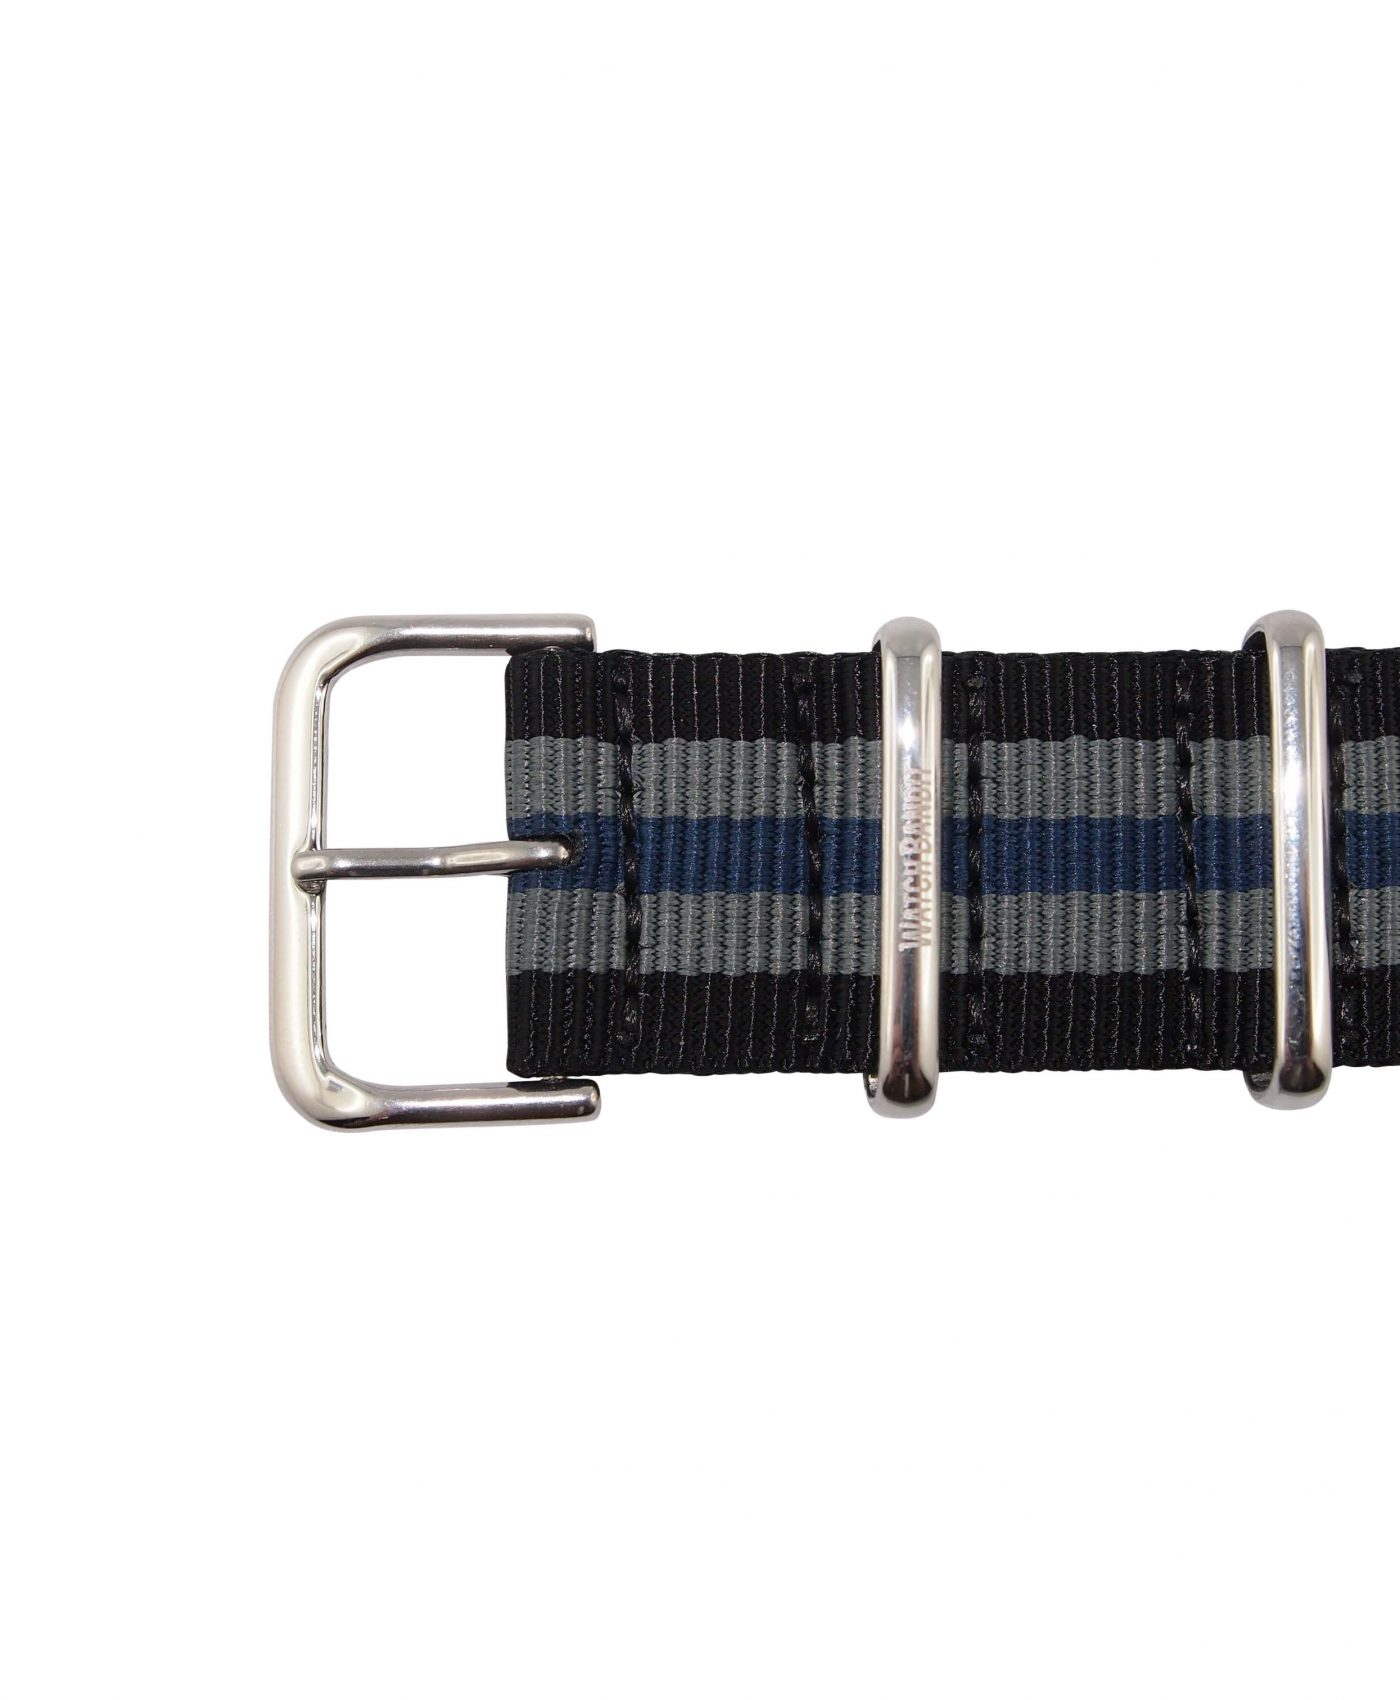 Nato Strap | Black, Blue & Silver| Polished | 22 mm